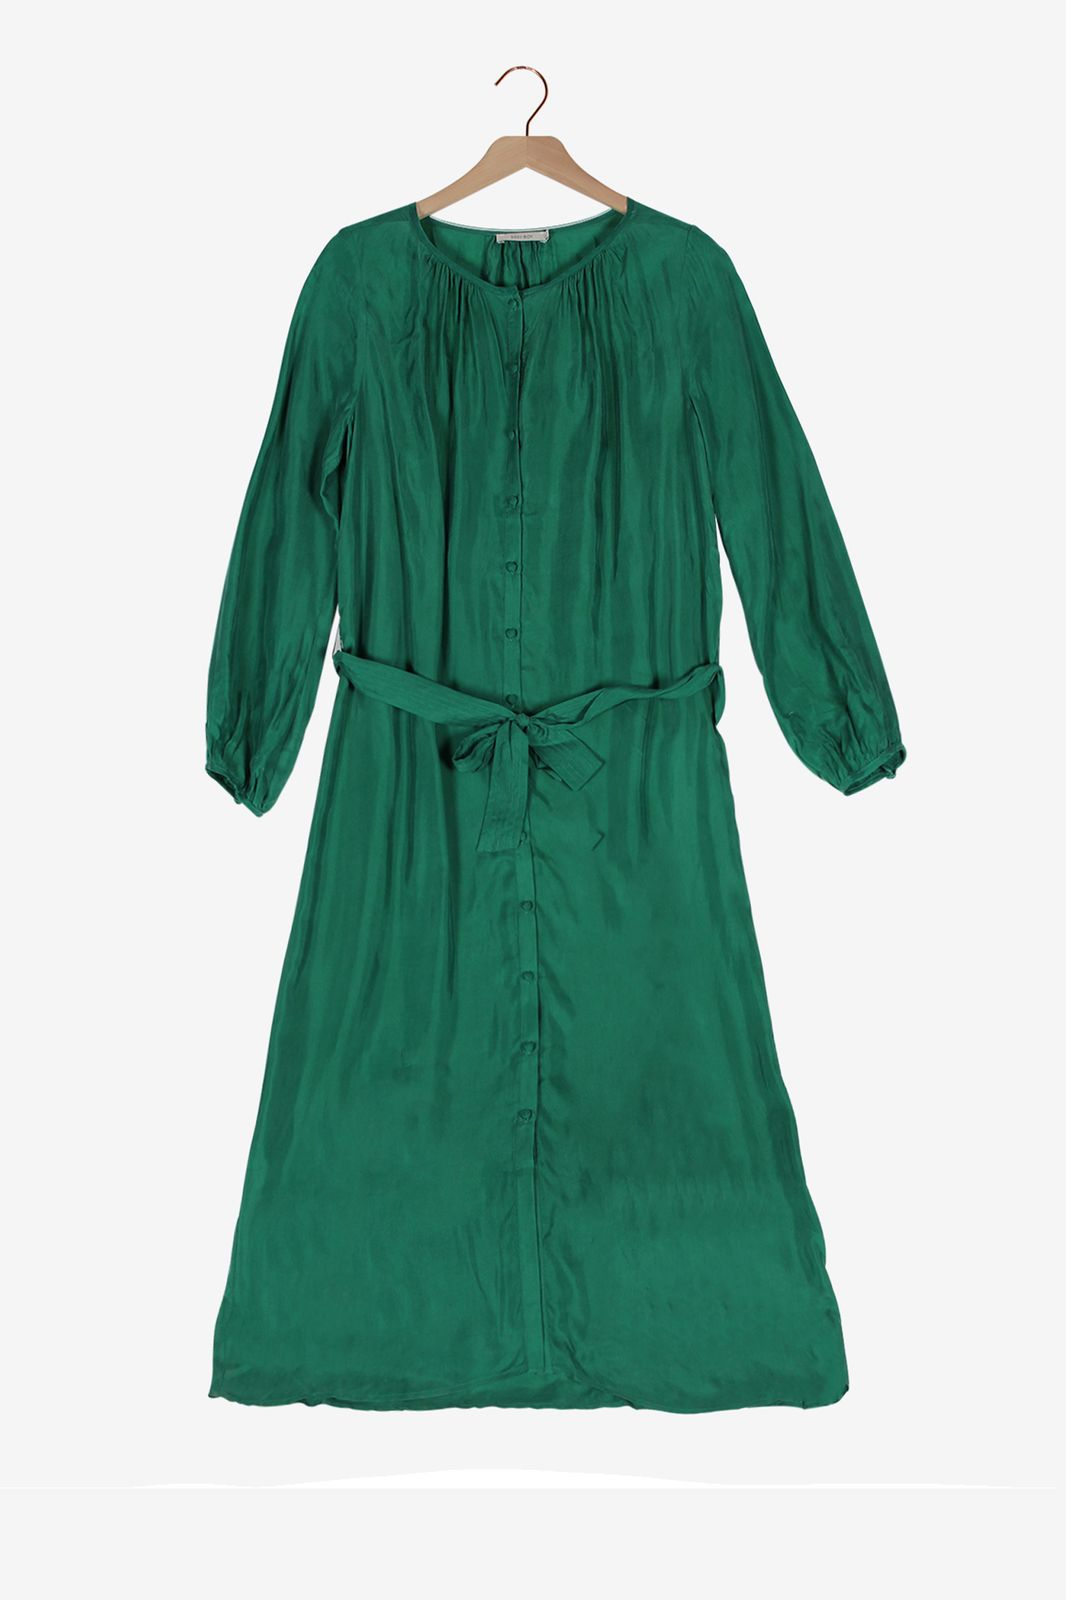 Groene jurk - Dames | Sissy-Boy